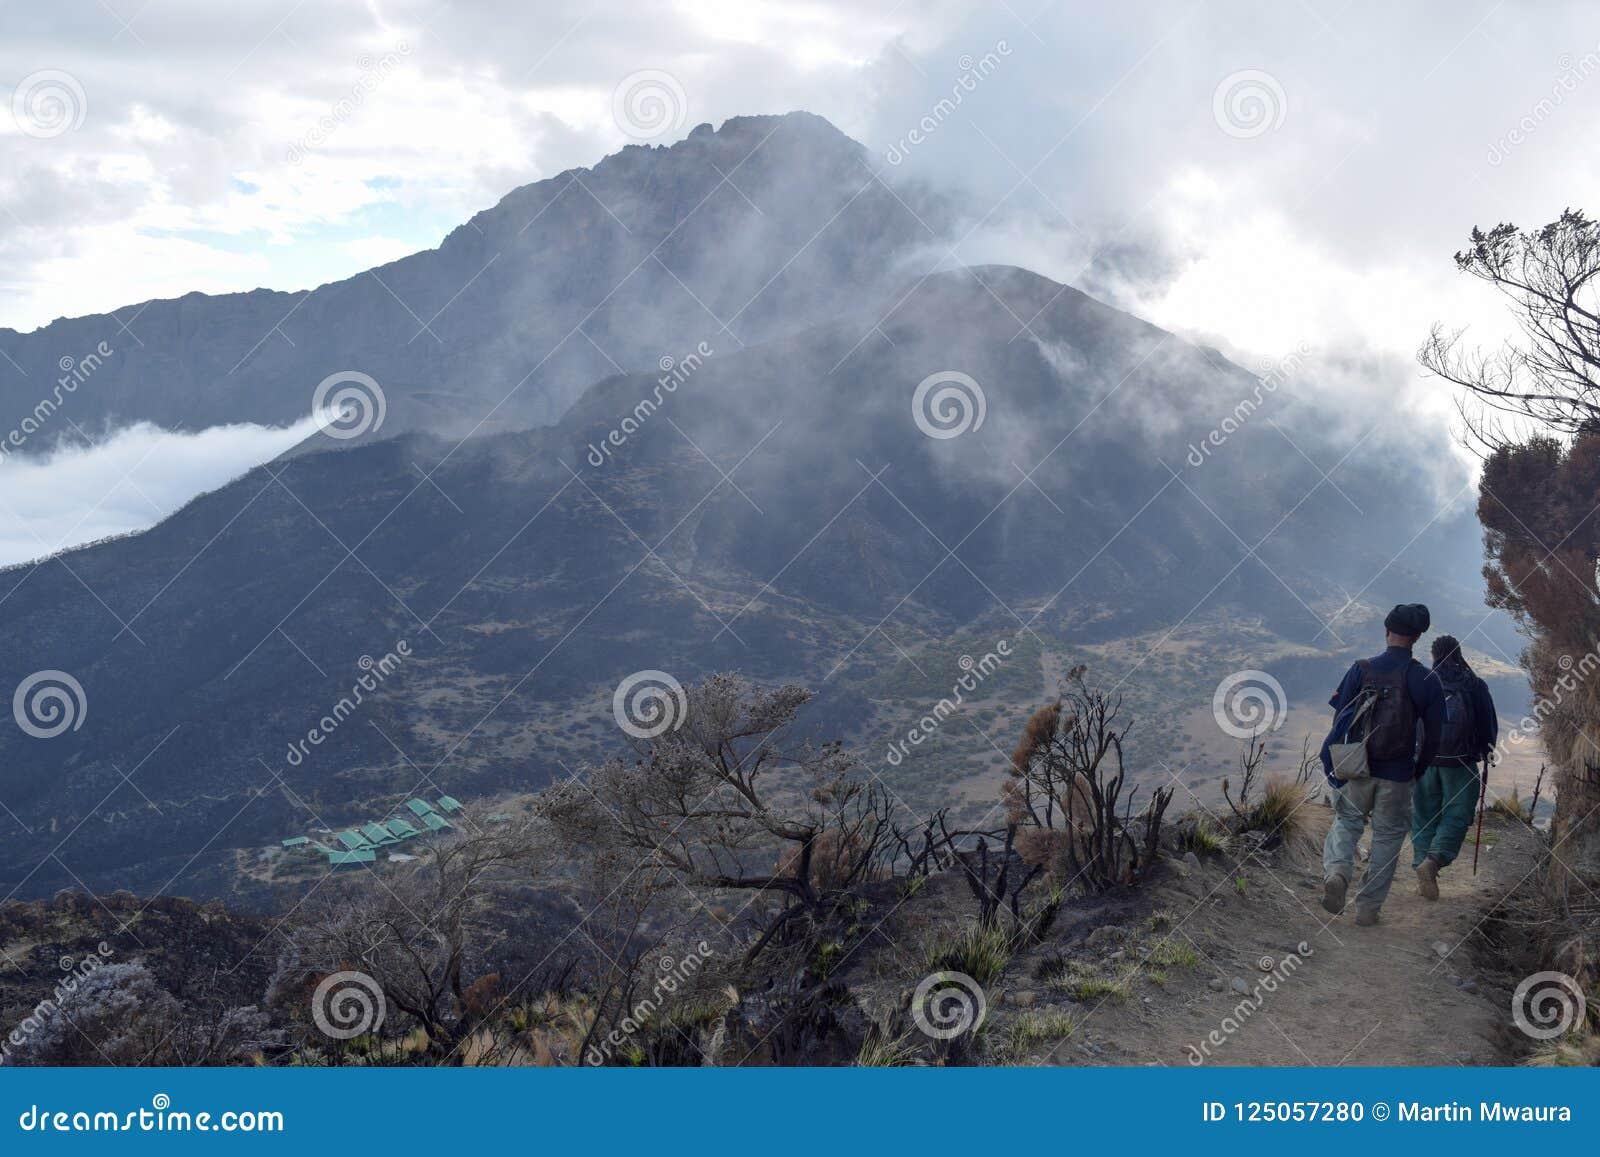 Mount Meru, Arusha National Park, Tanzania